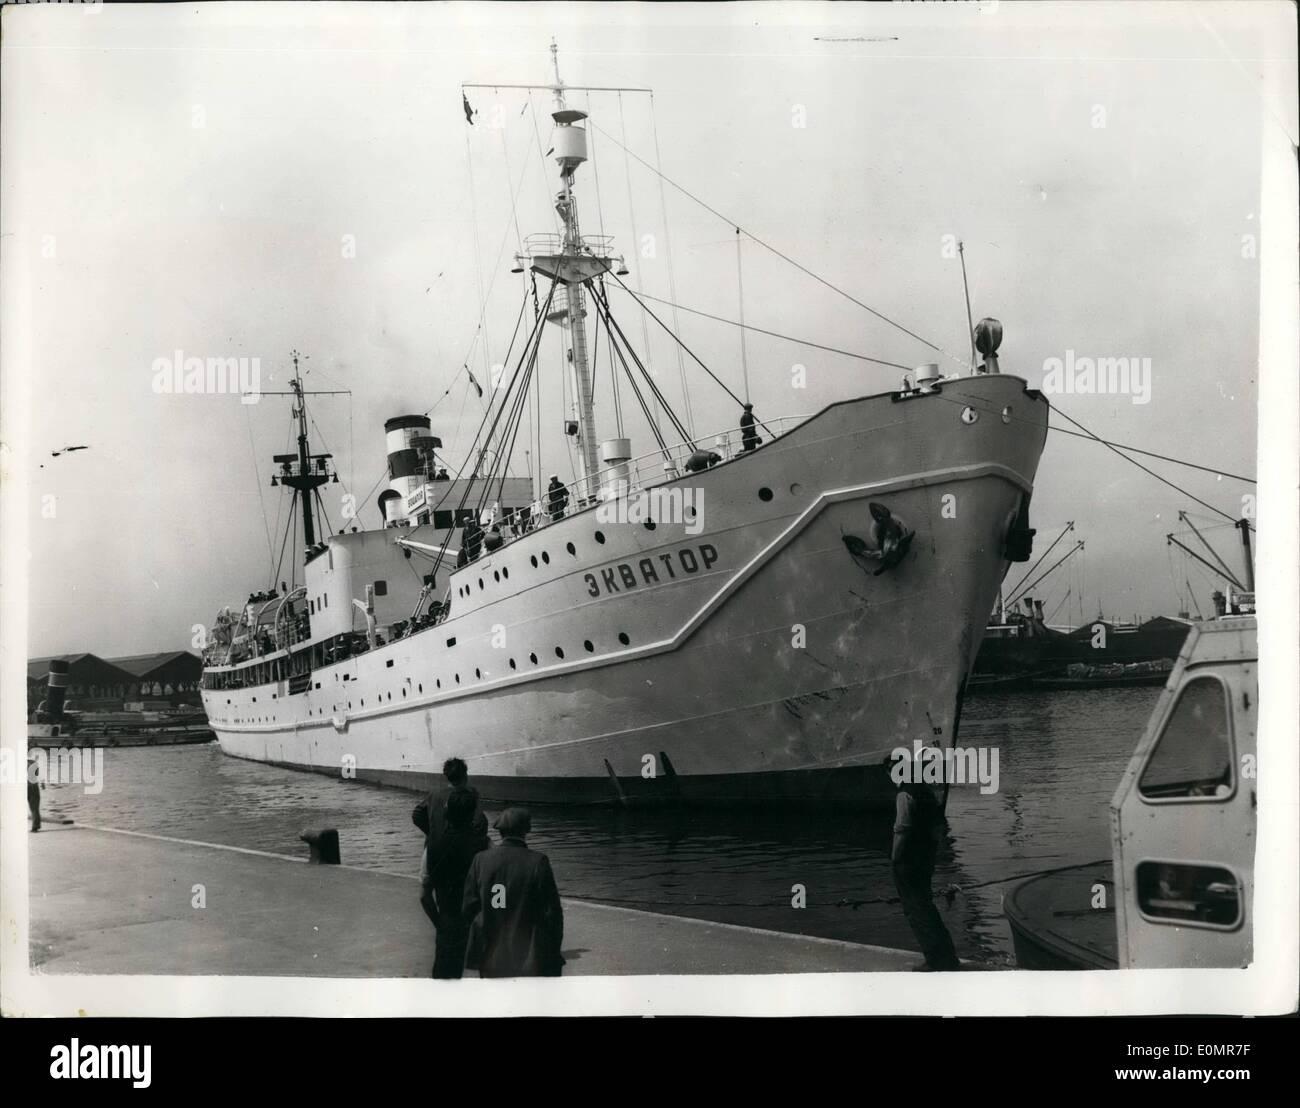 Cadet Ship Stock Photos & Cadet Ship Stock Images - Alamy